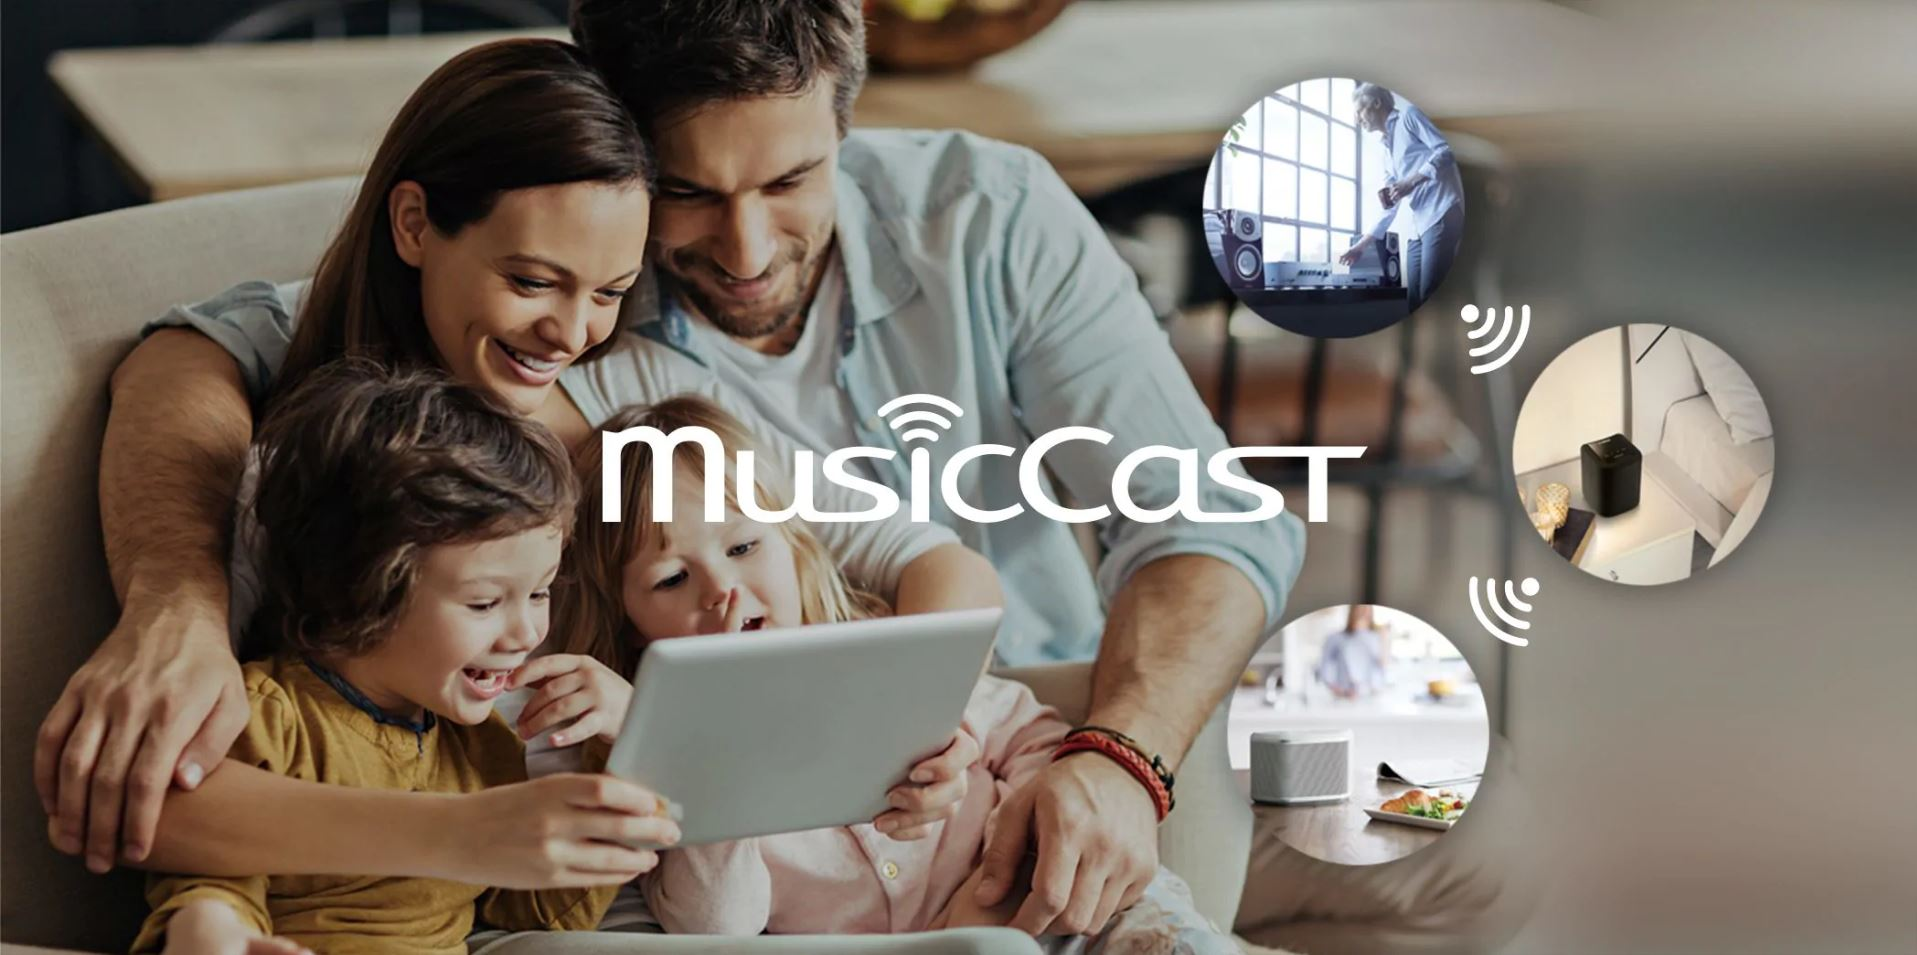 https://lamarque.fillion.ca/wp-content/uploads/2019/03/famille-musiccast.jpg